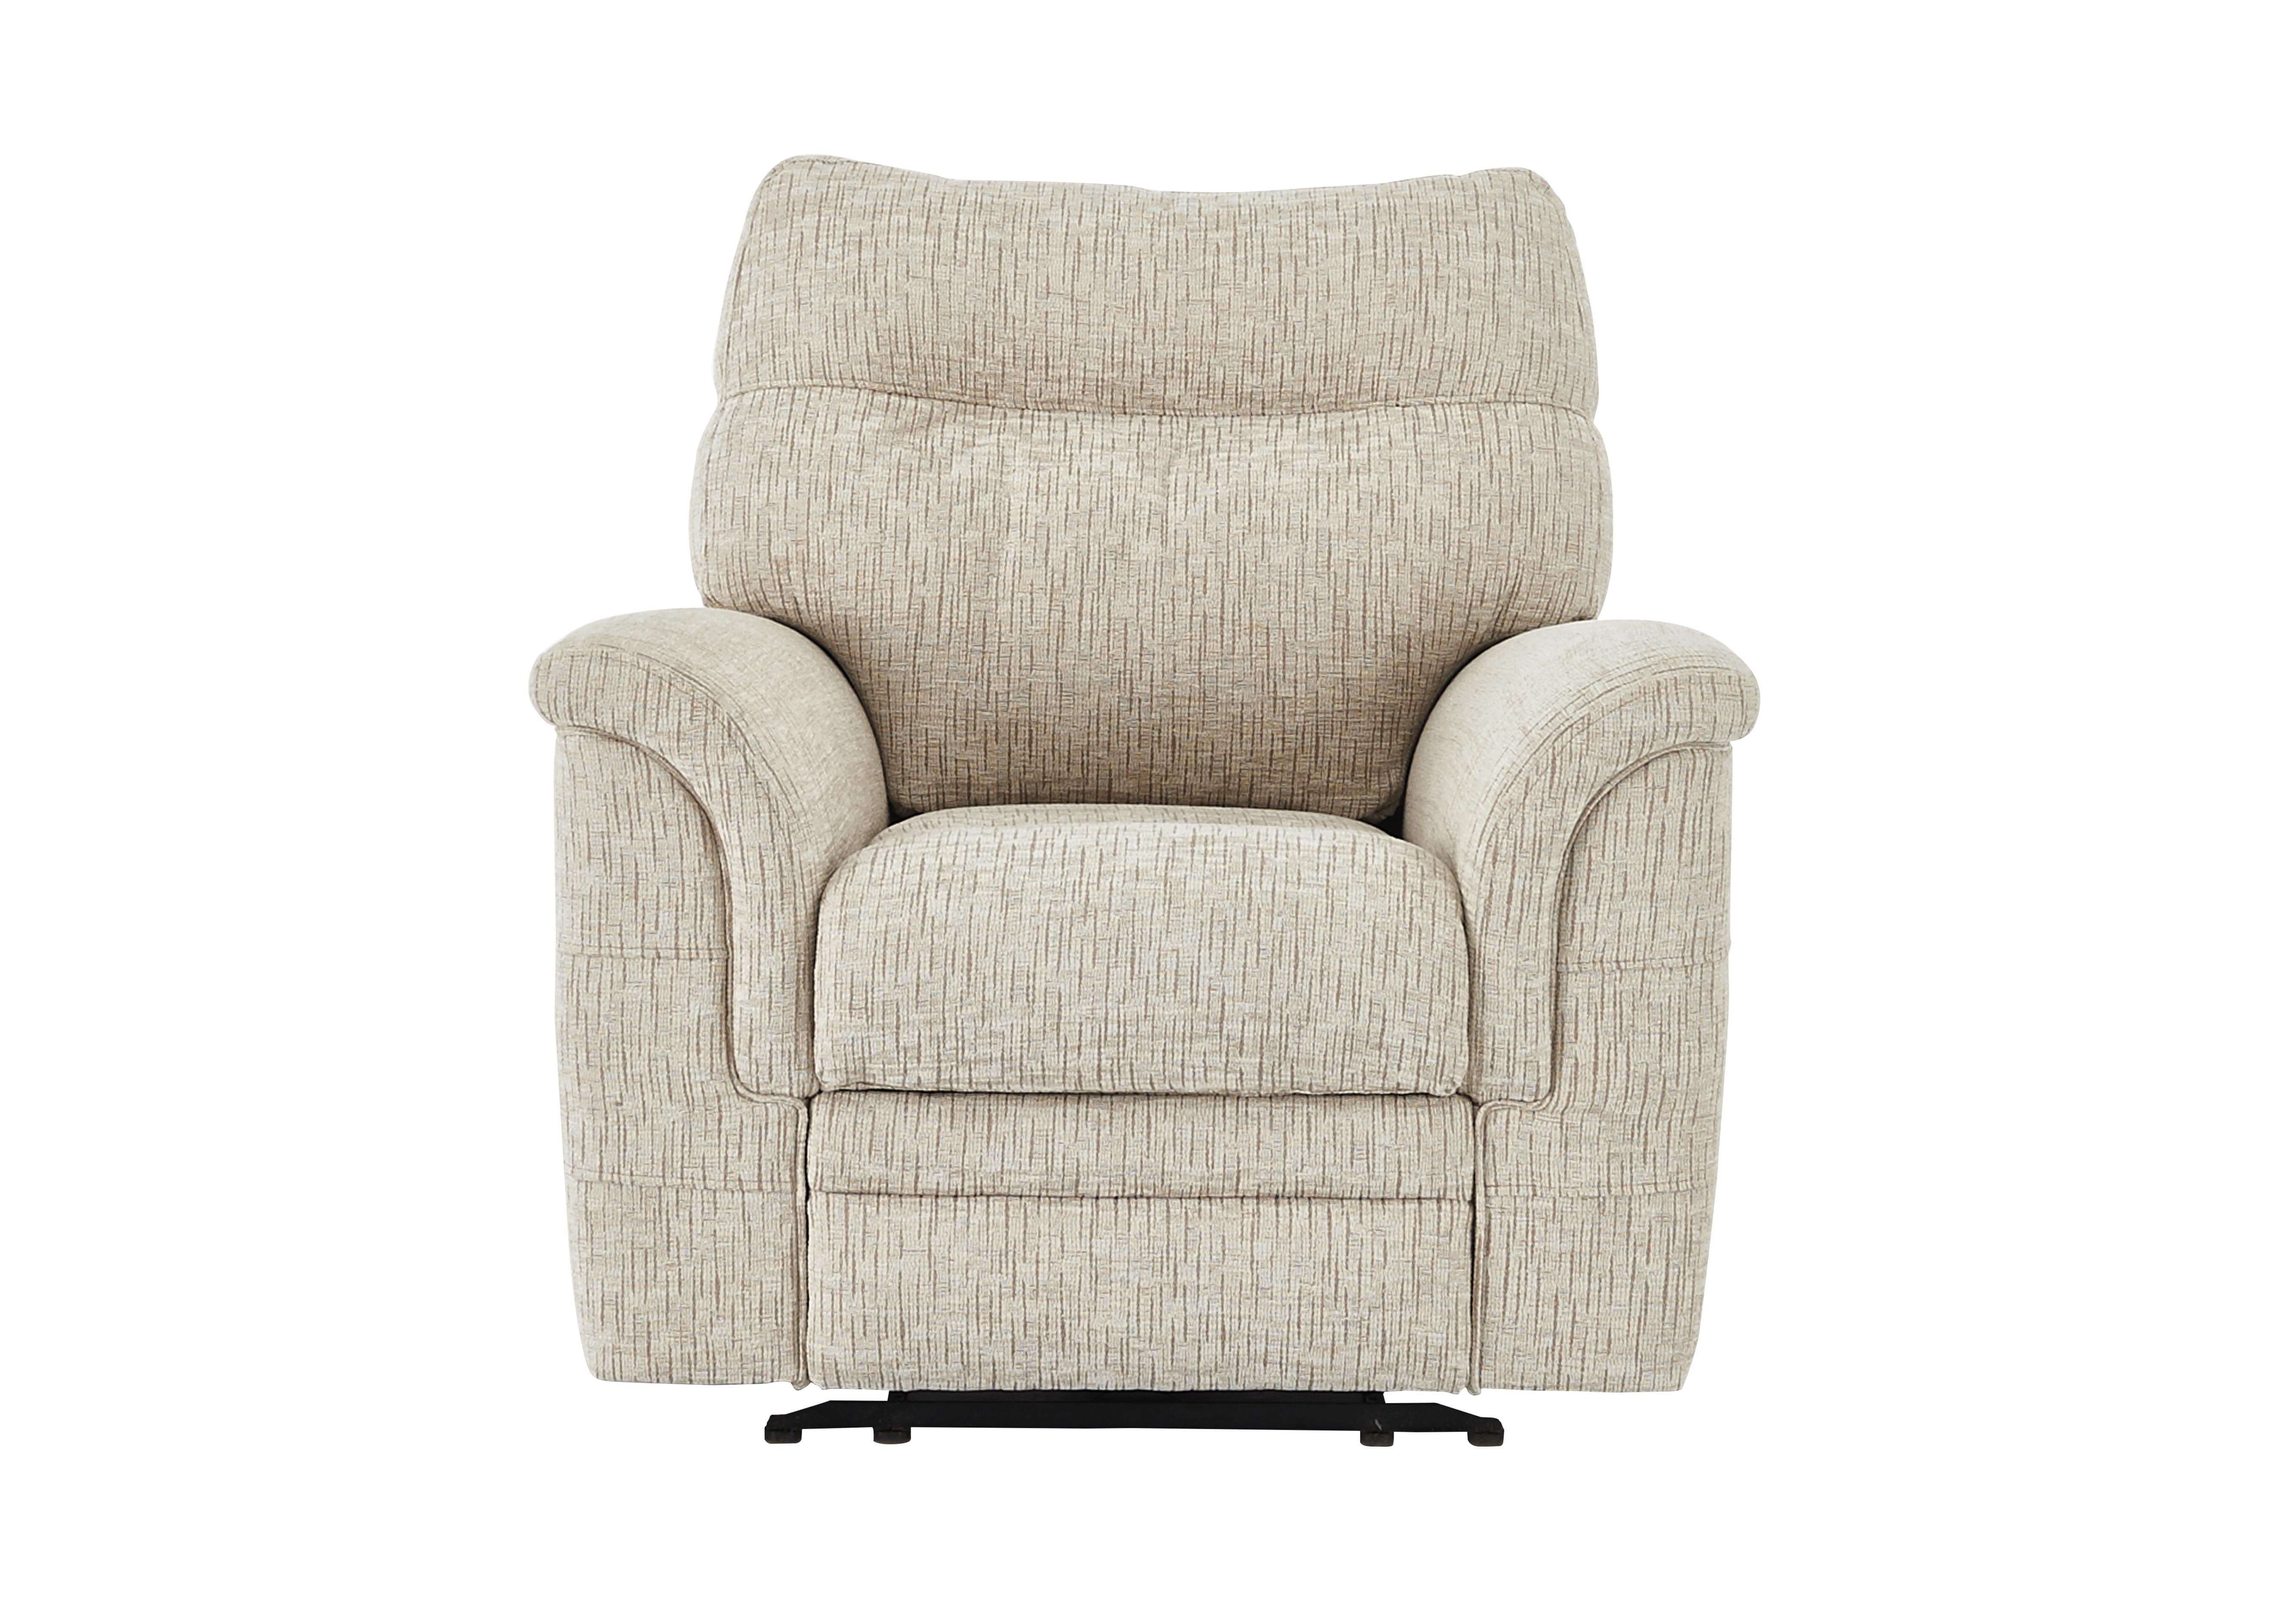 Save £340. Parker Knoll Hudson Fabric Recliner Armchair  sc 1 st  Furniture Village & Fabric Recliner armchairs - Furniture Village islam-shia.org